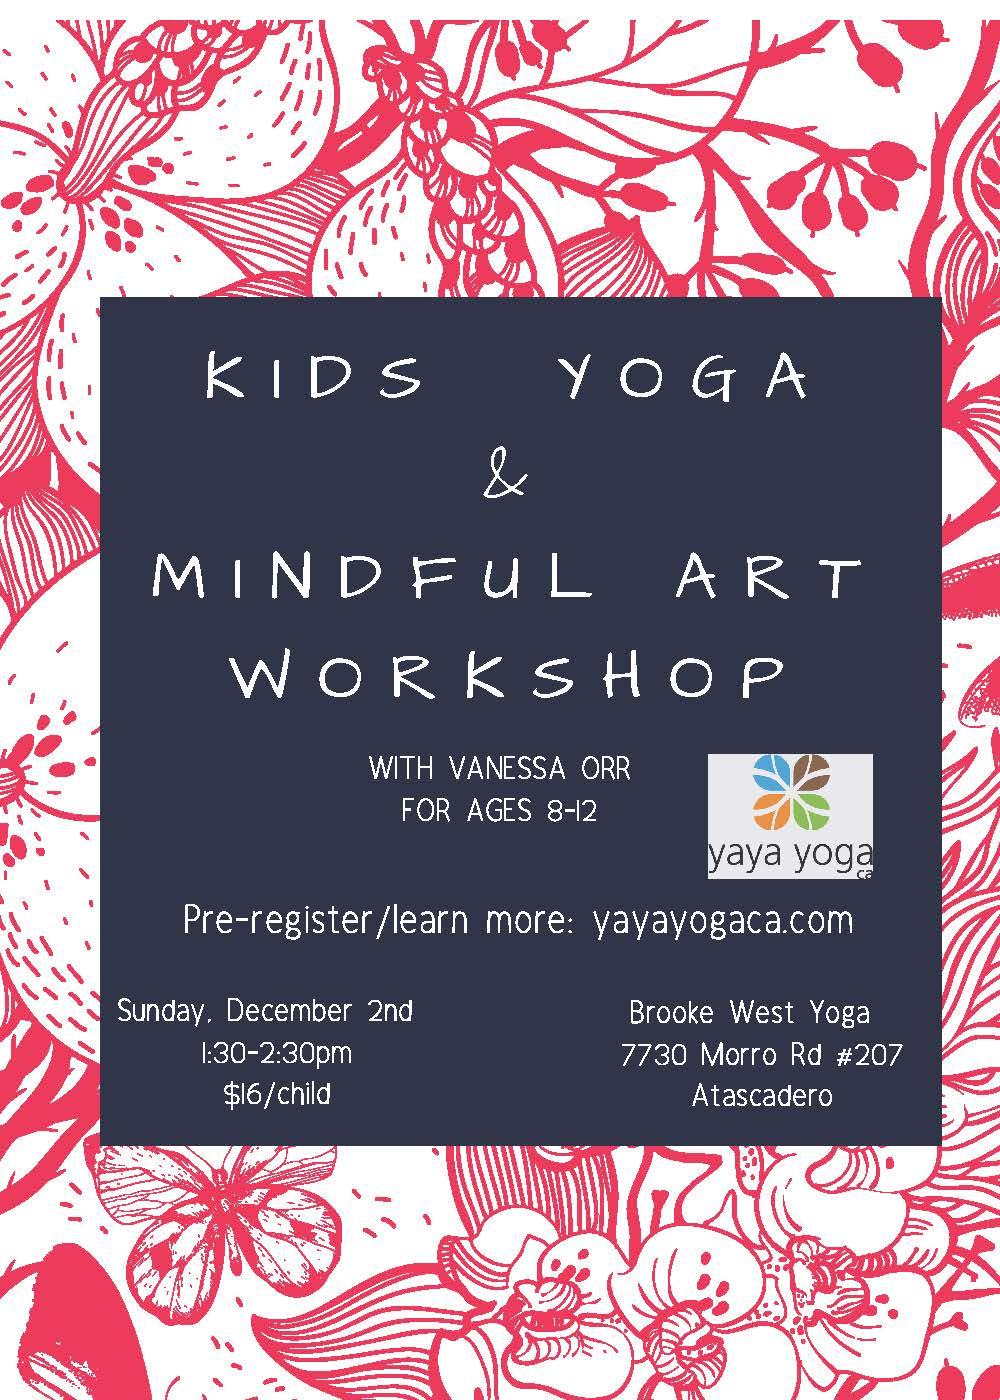 Kids Yoga Mindful Art At Brooke West Yoga Yaya Yoga Ca